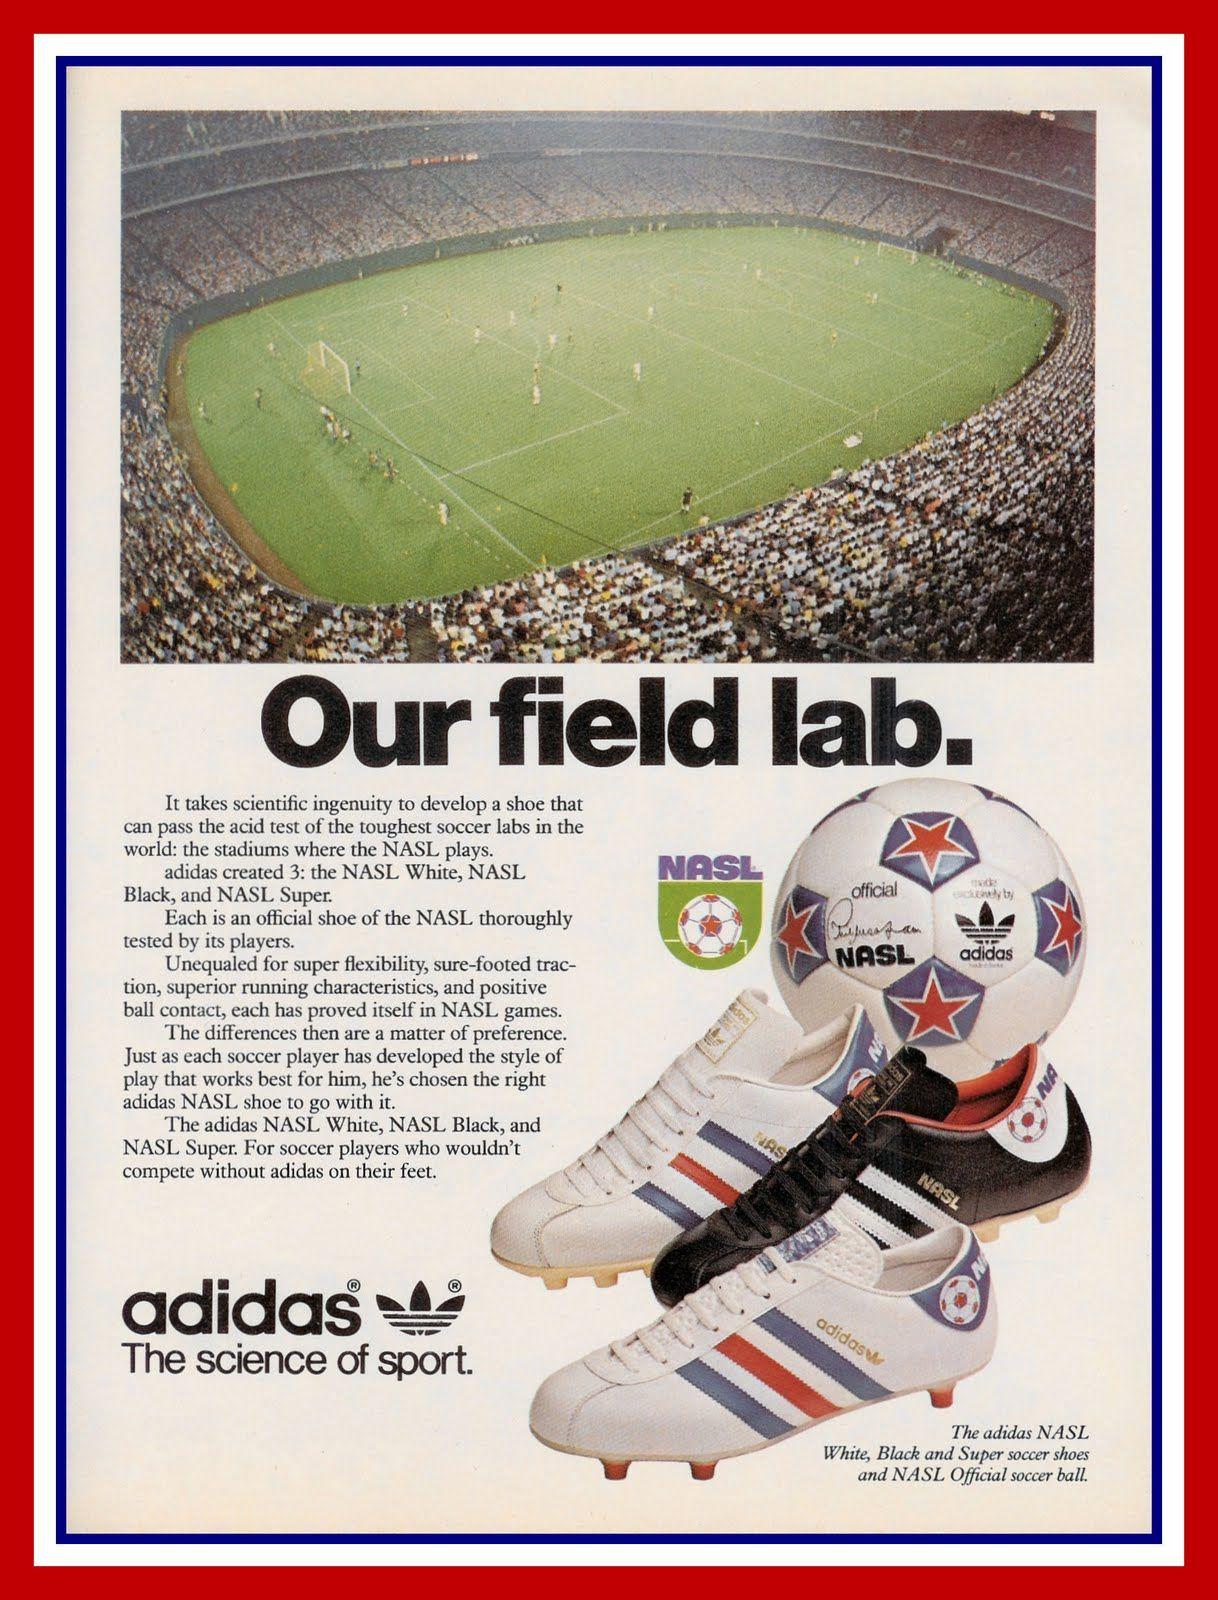 Our Field Lab   Adidas football, Vintage adidas, Sports brands